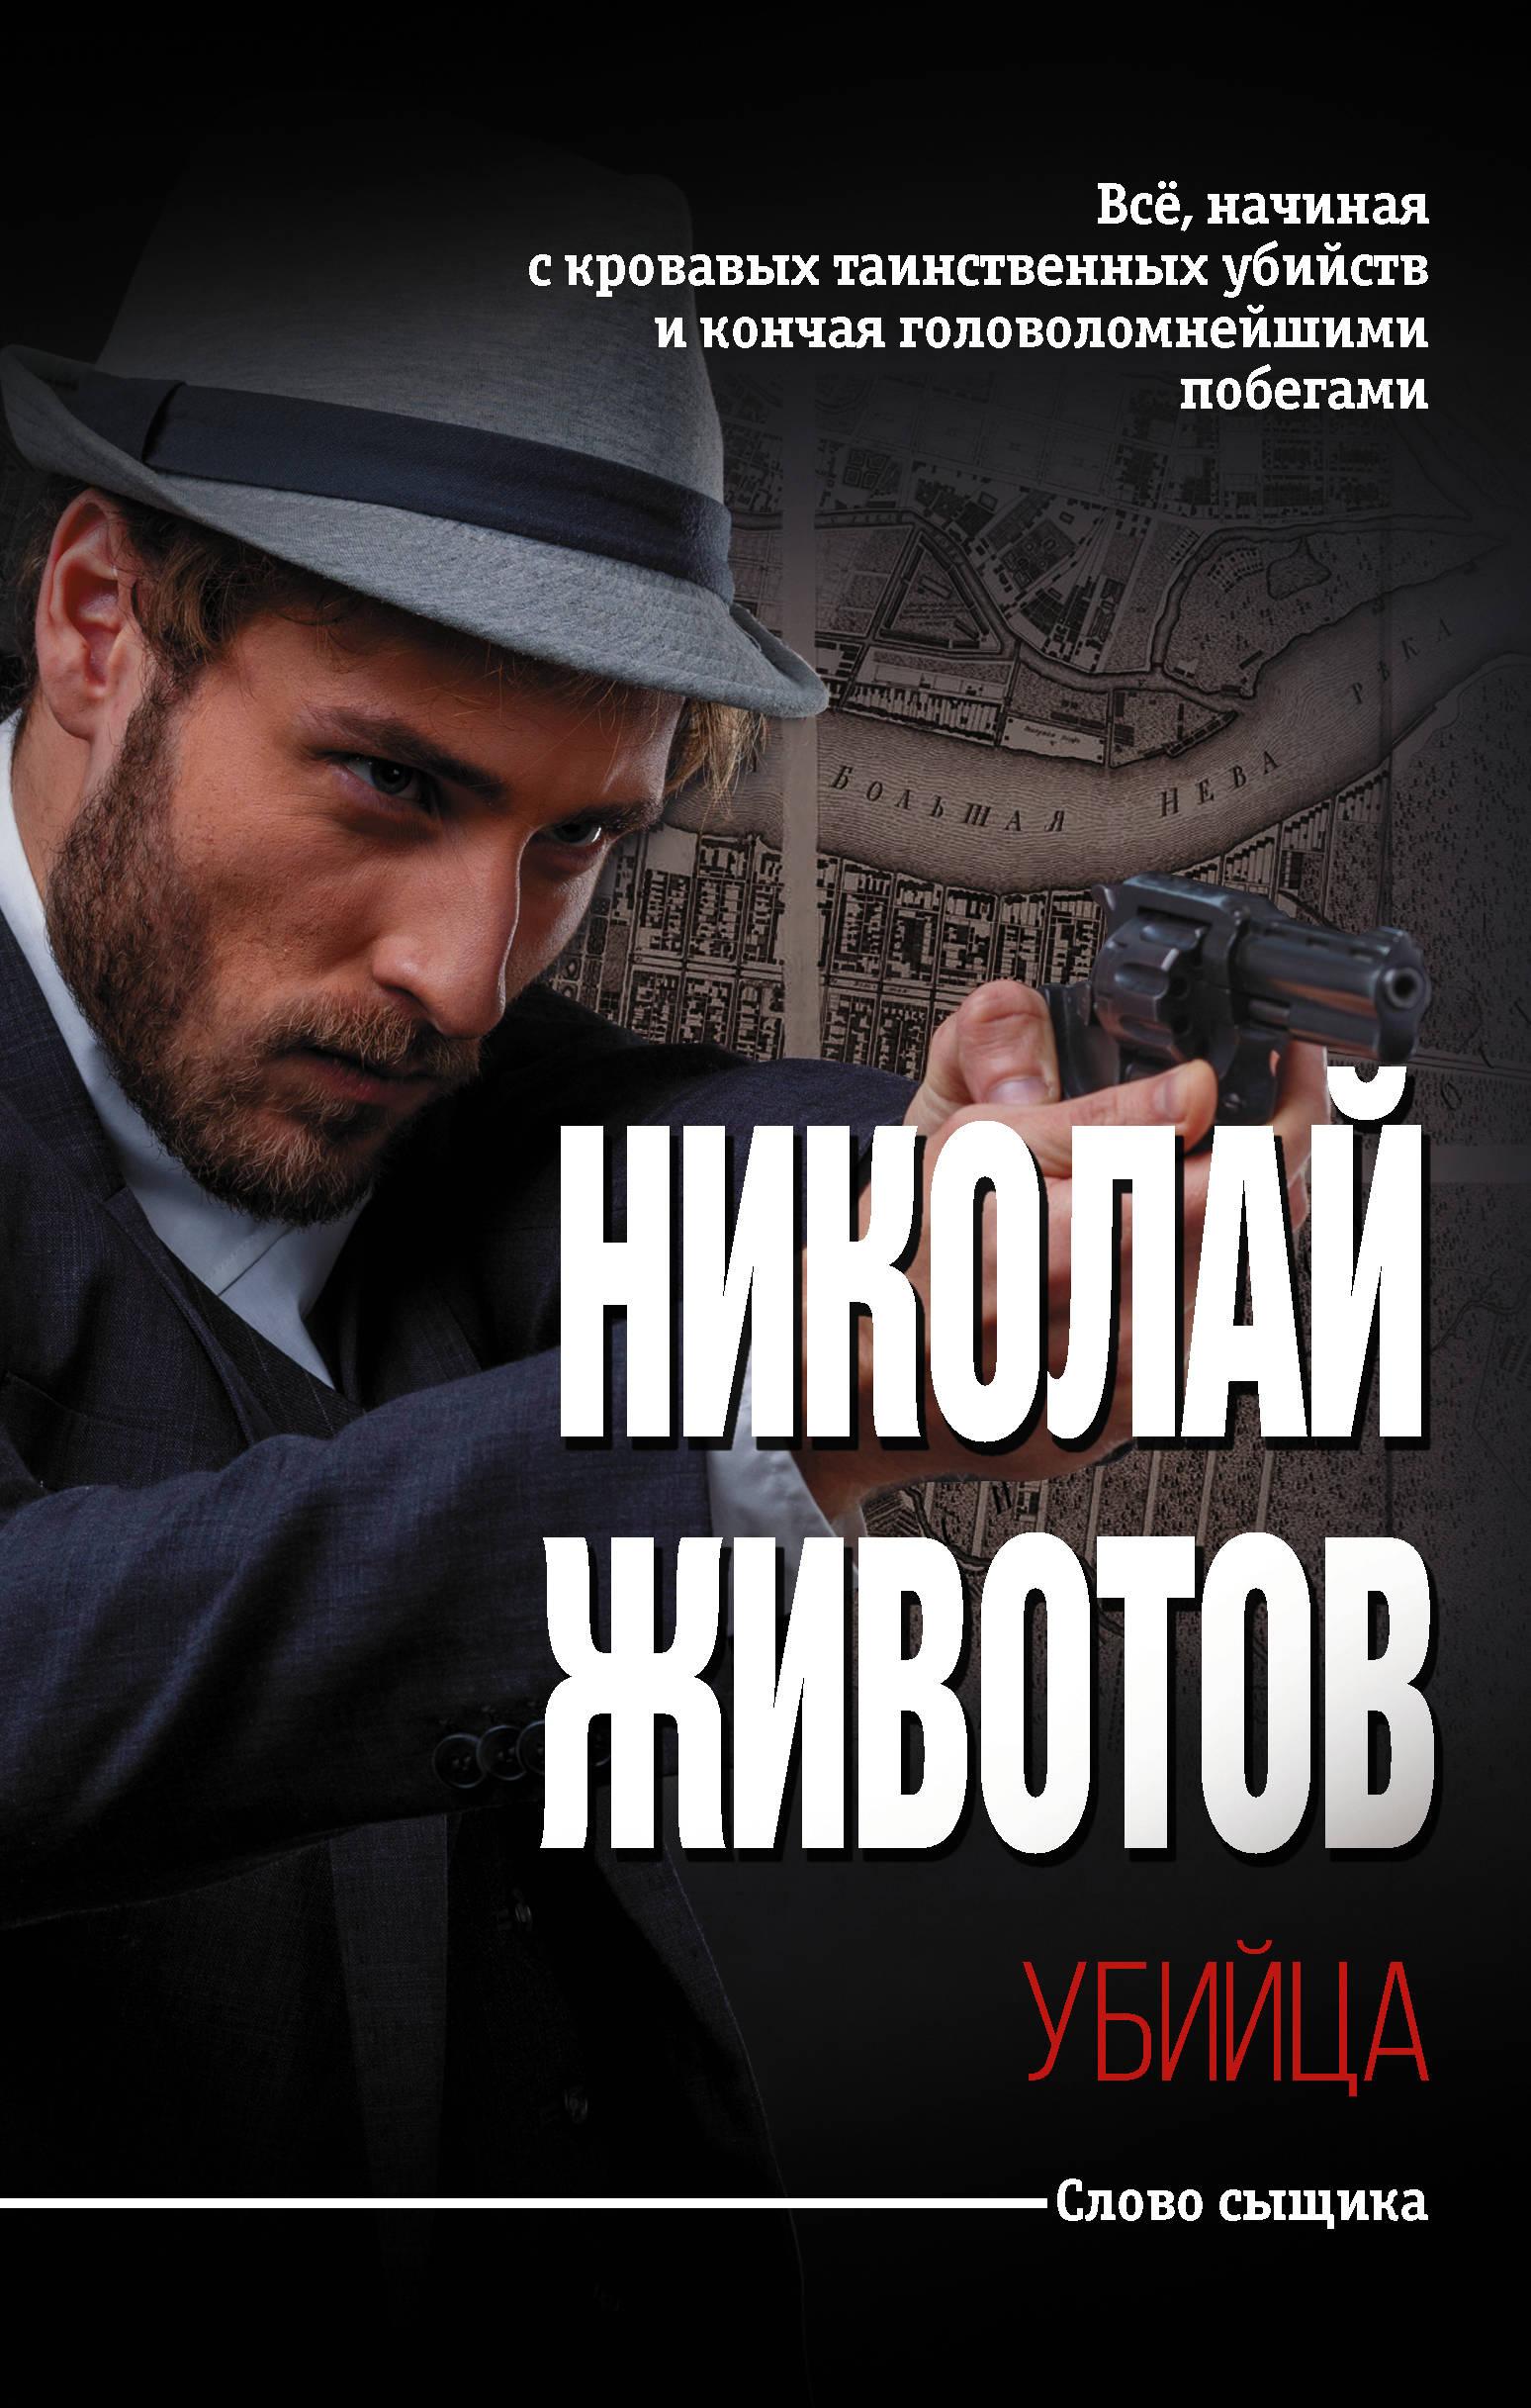 Животов Николай Николаевич Убийца